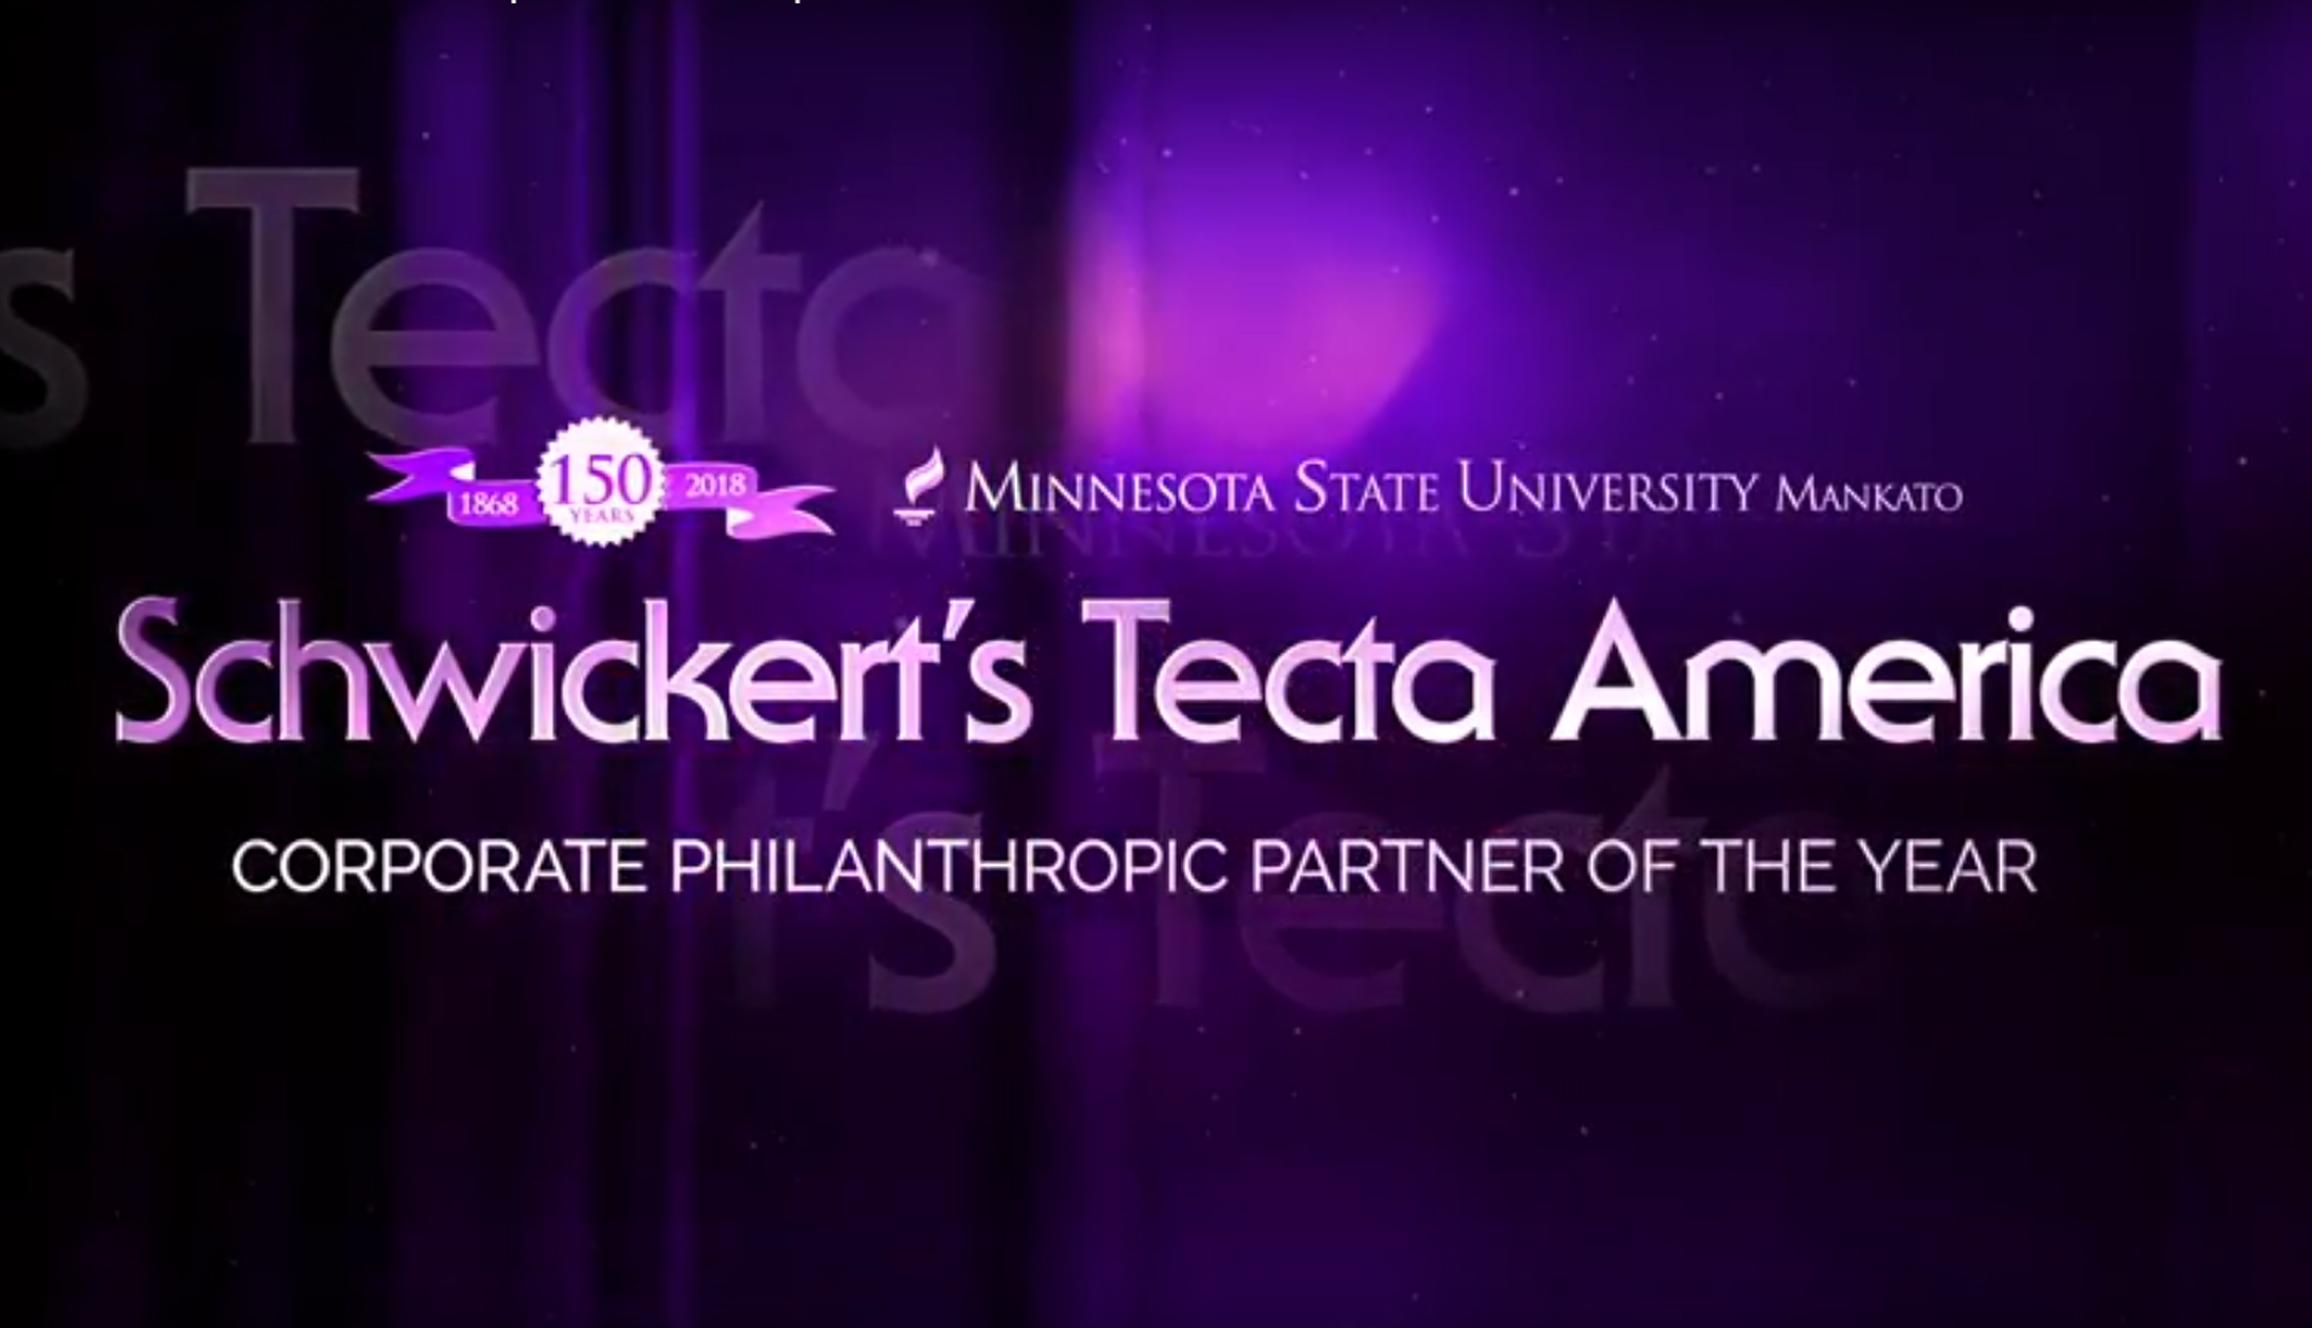 Schwickerts Tecta America Philanthropic Award